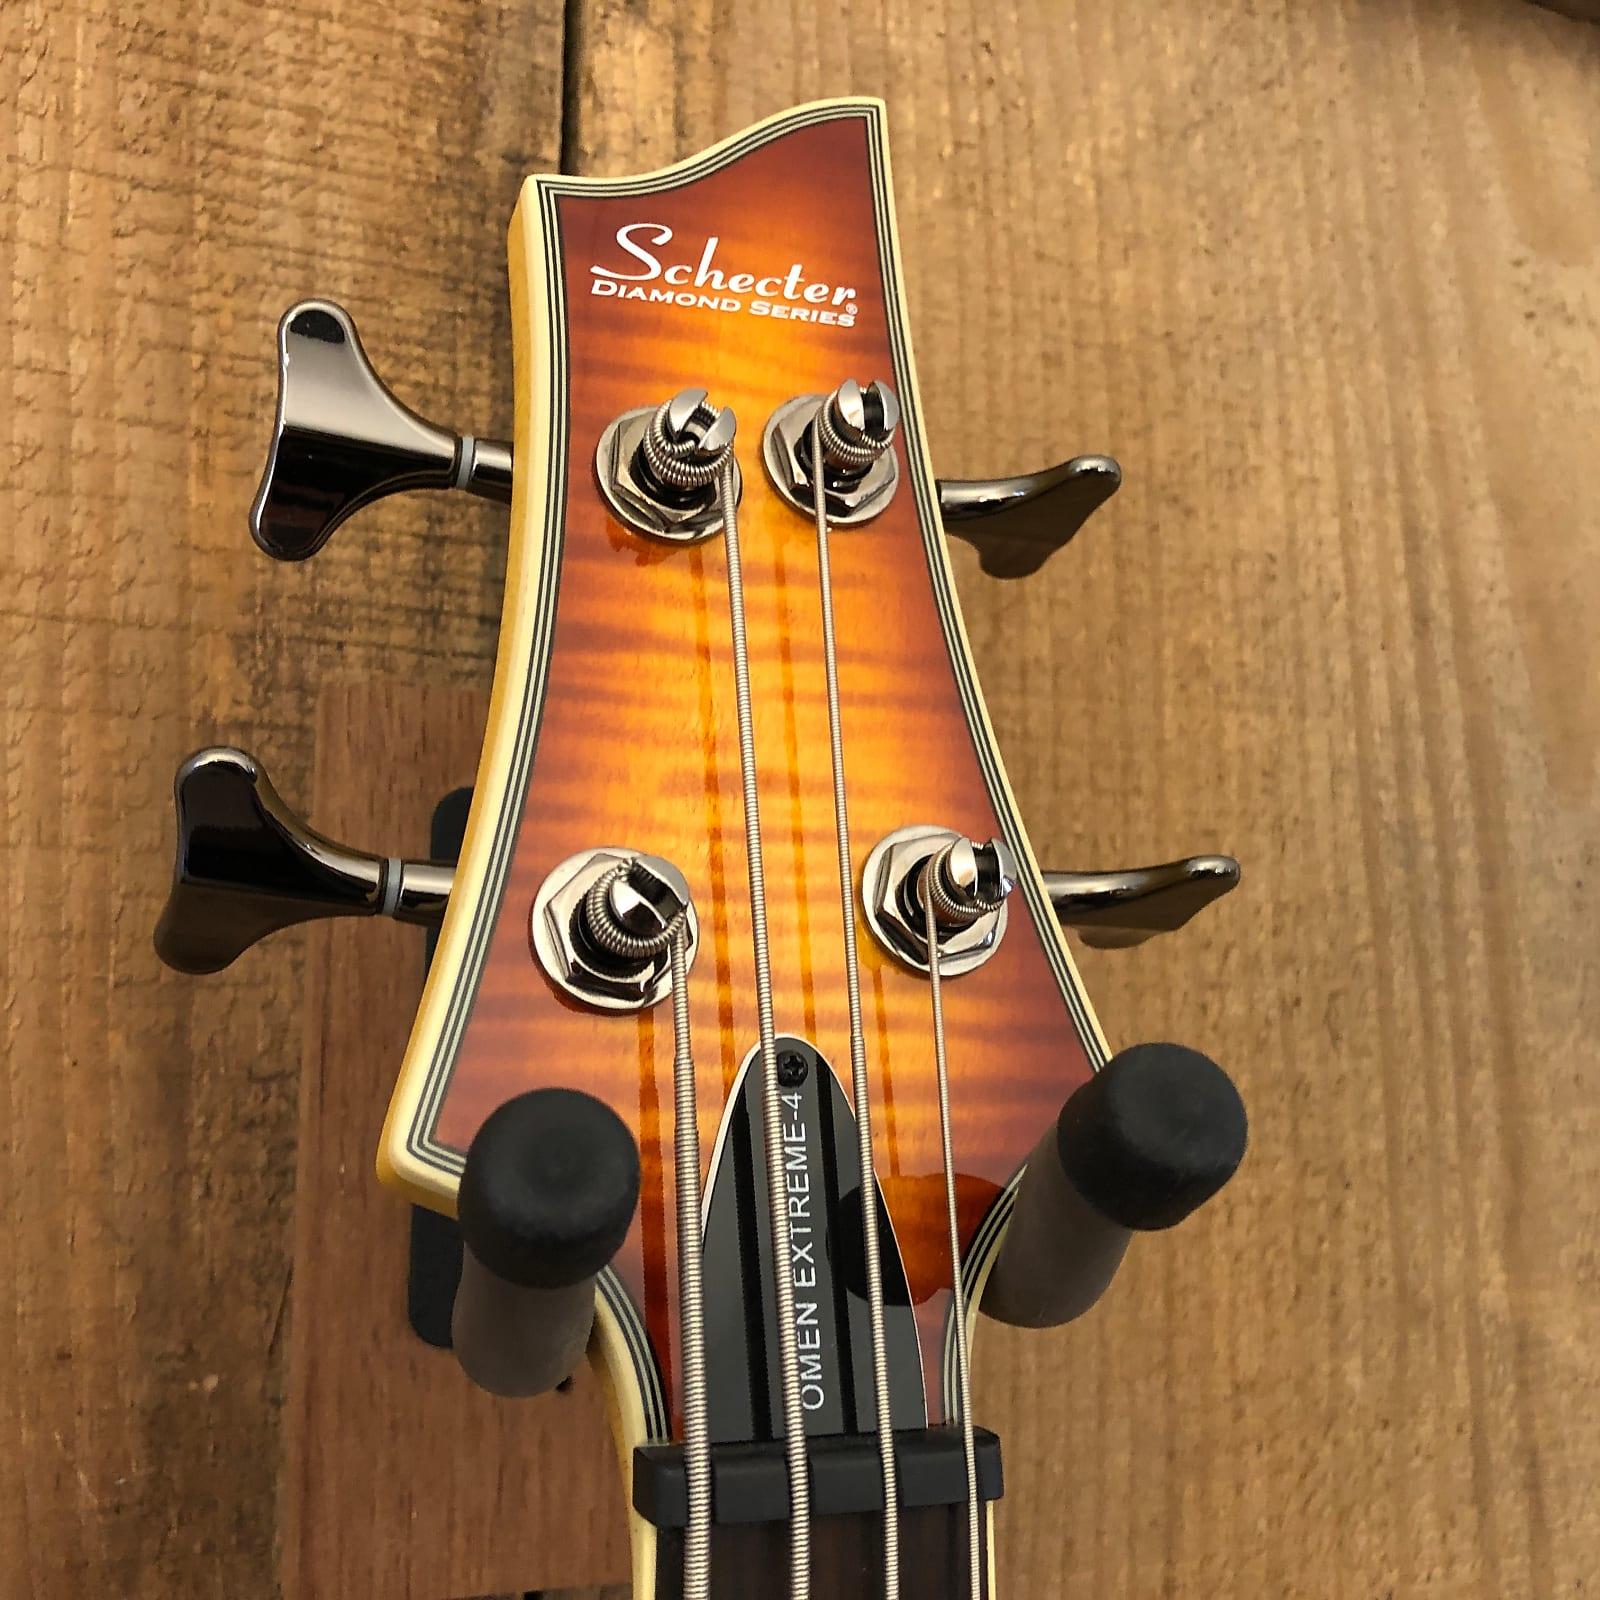 Schecter Omen Extreme-4 Active Bass Guitar Vintage Sunburst 2018